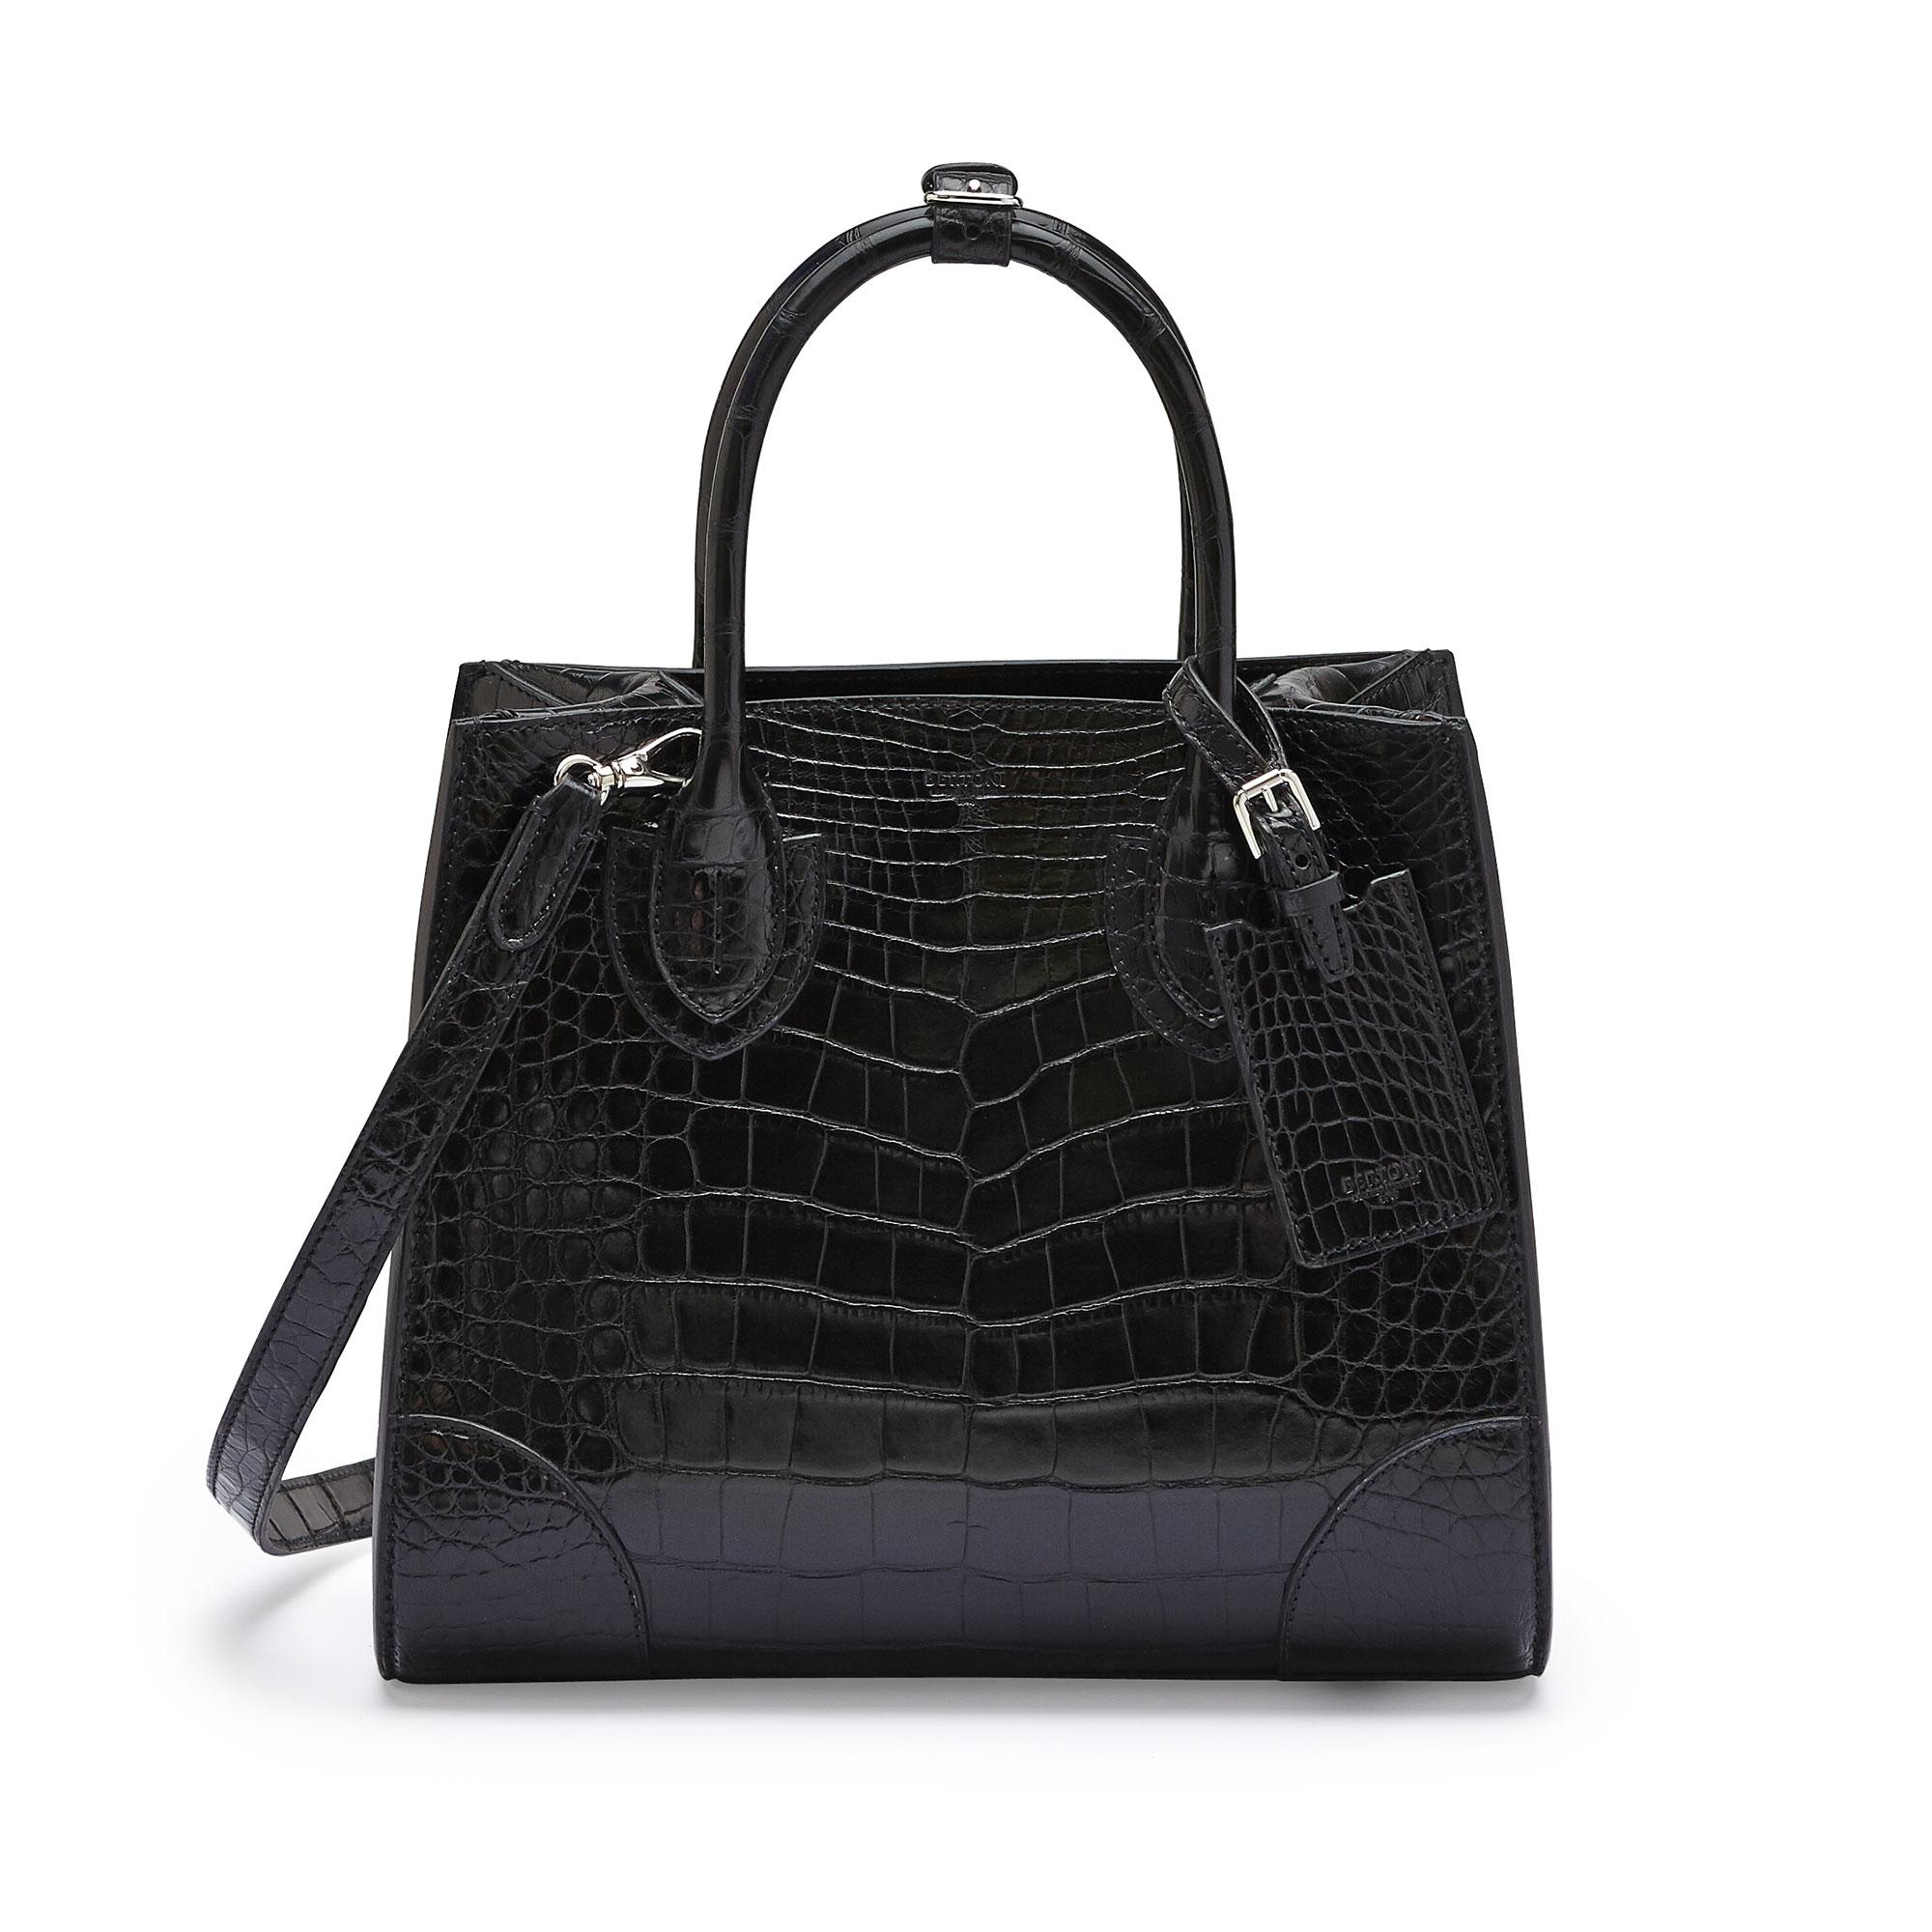 The black alligator Darcy medium bag by Bertoni 1949 01